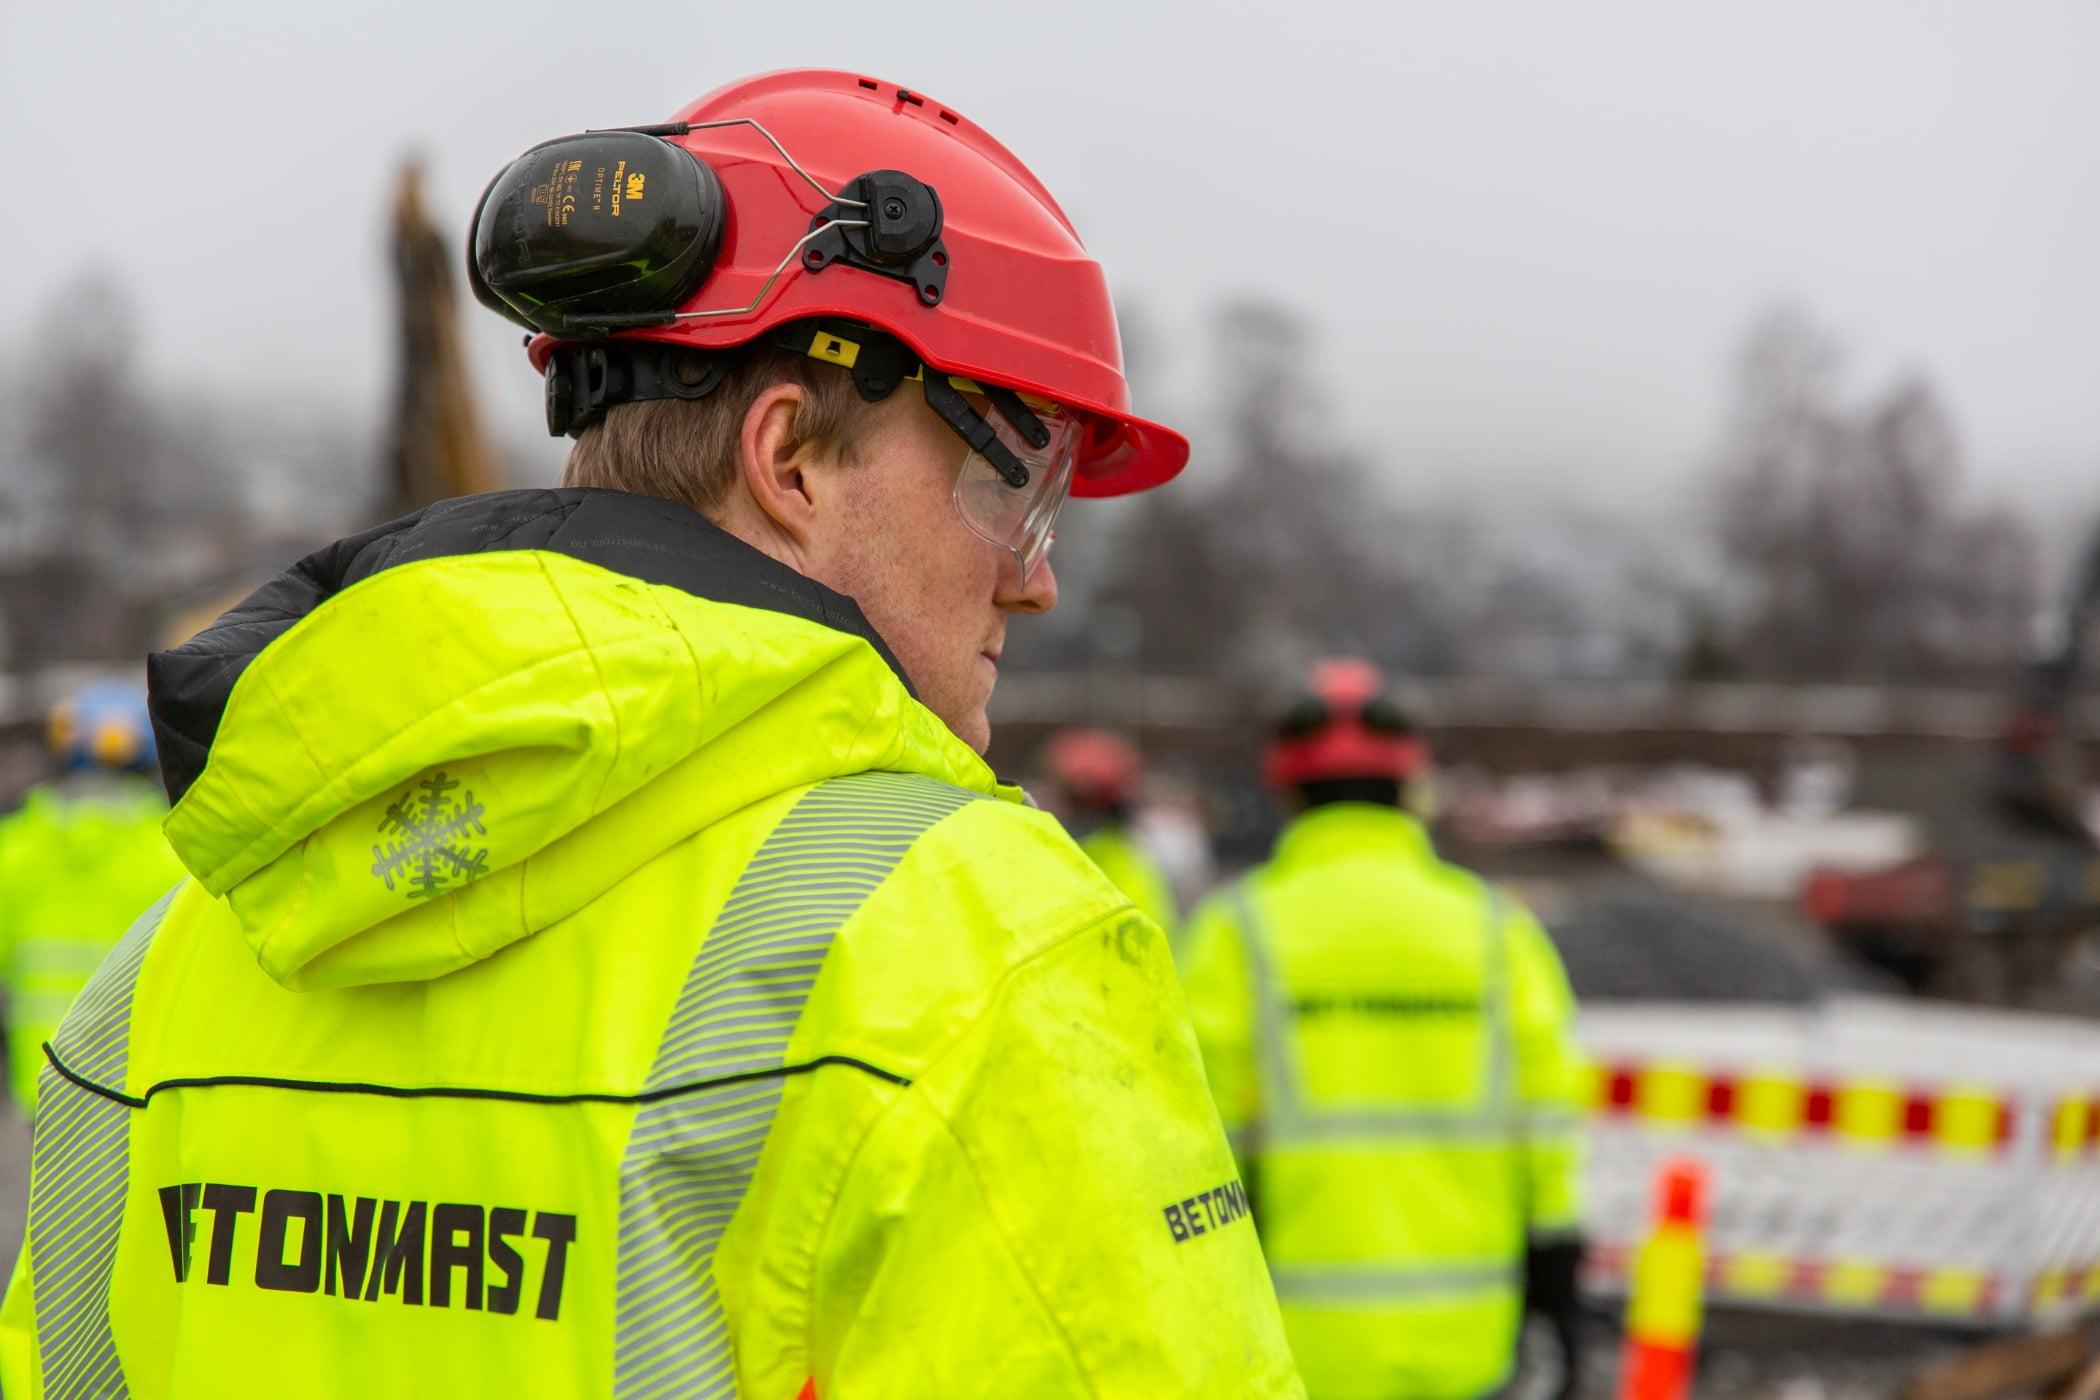 High-visibility clothing, Hard hat, Motor vehicle, Helmet, Workwear, Sunglasses, Goggles